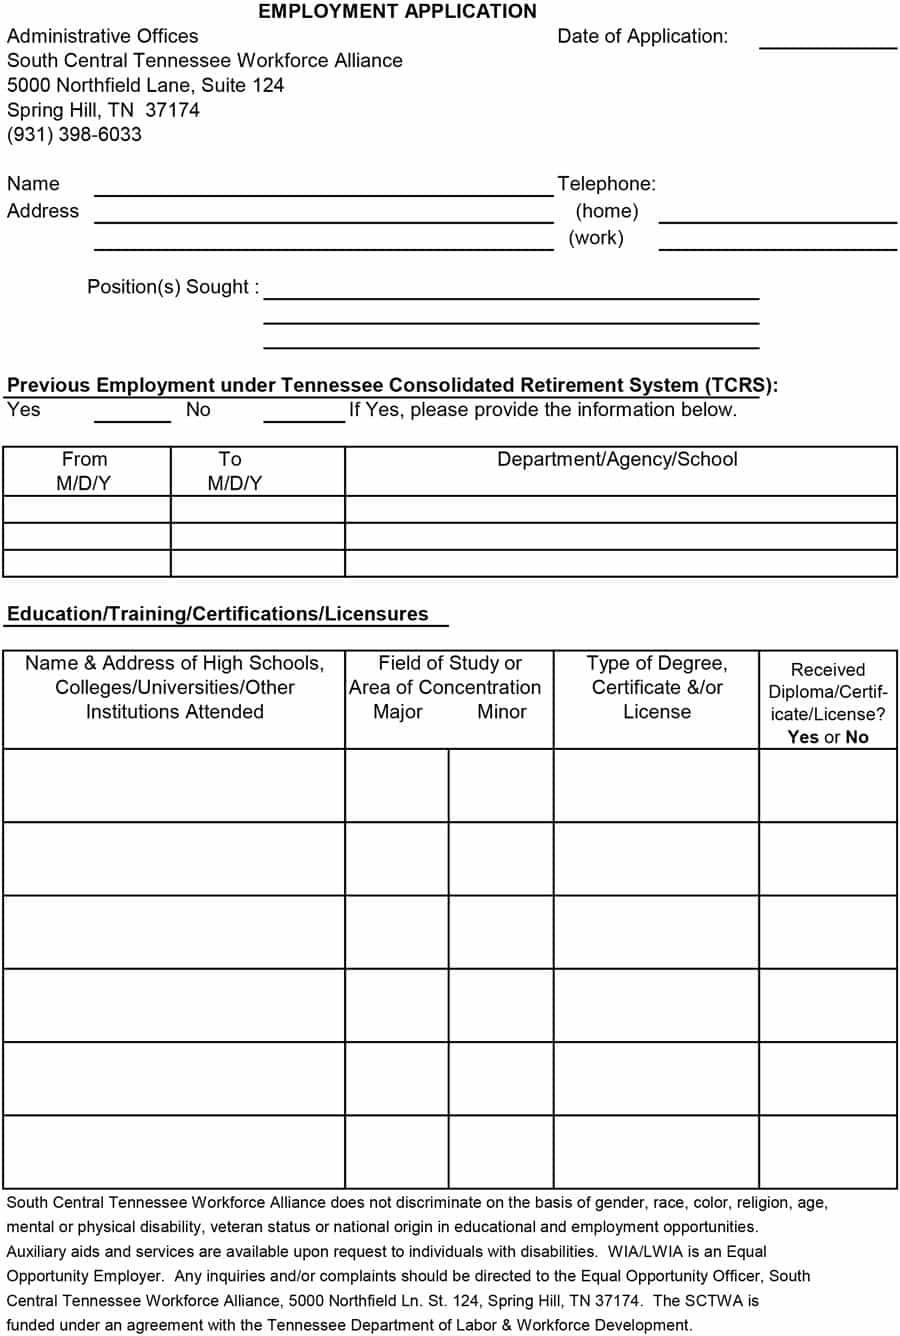 50 Free Employment / Job Application Form Templates [Printable] ᐅ - Free Printable Employment Application